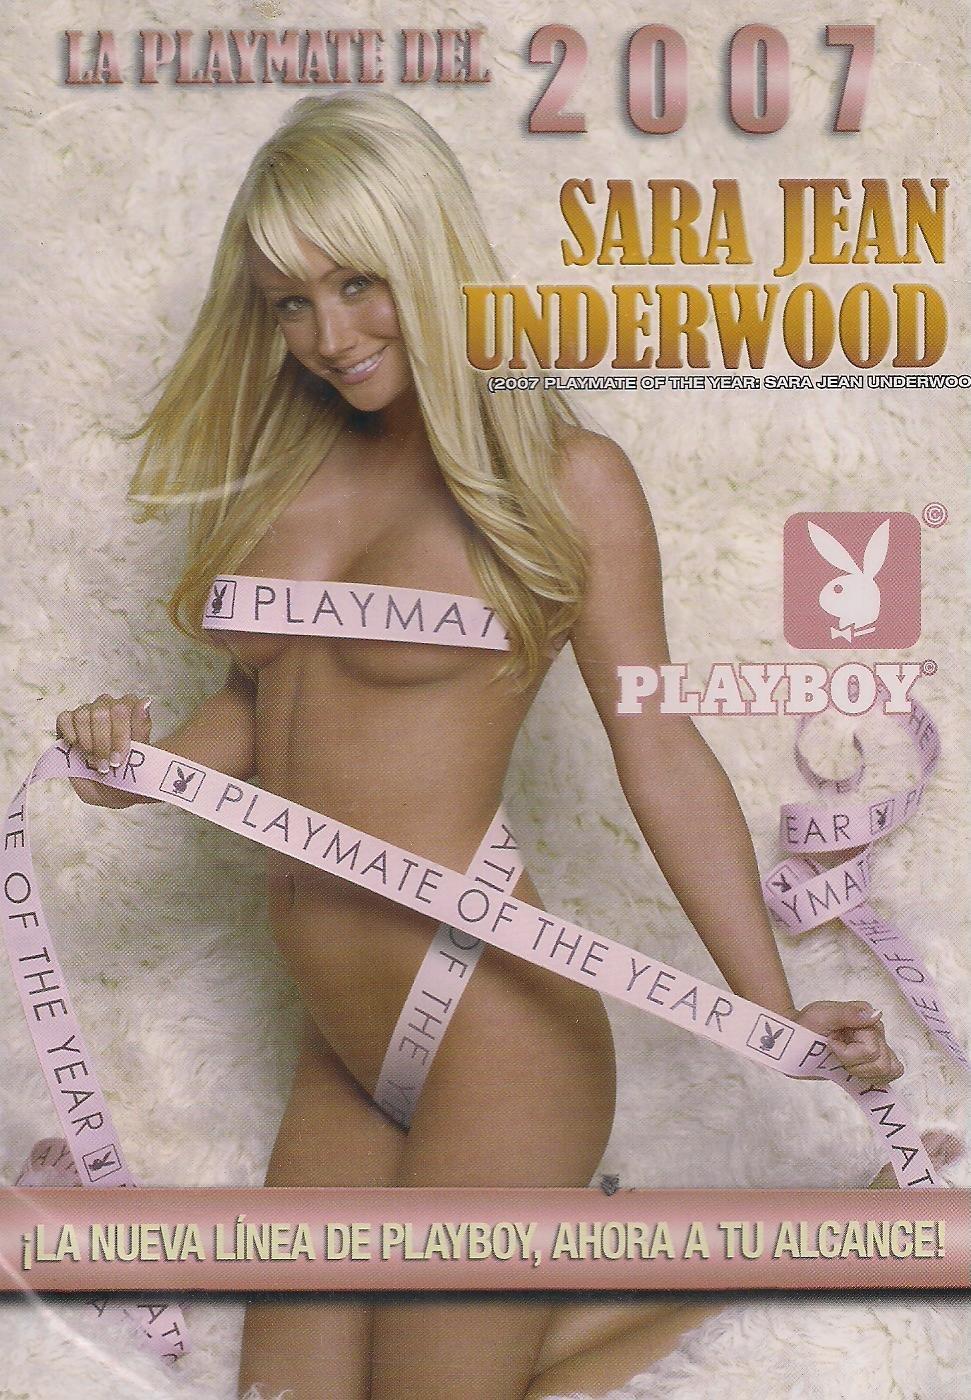 underwood playmate jean Sara